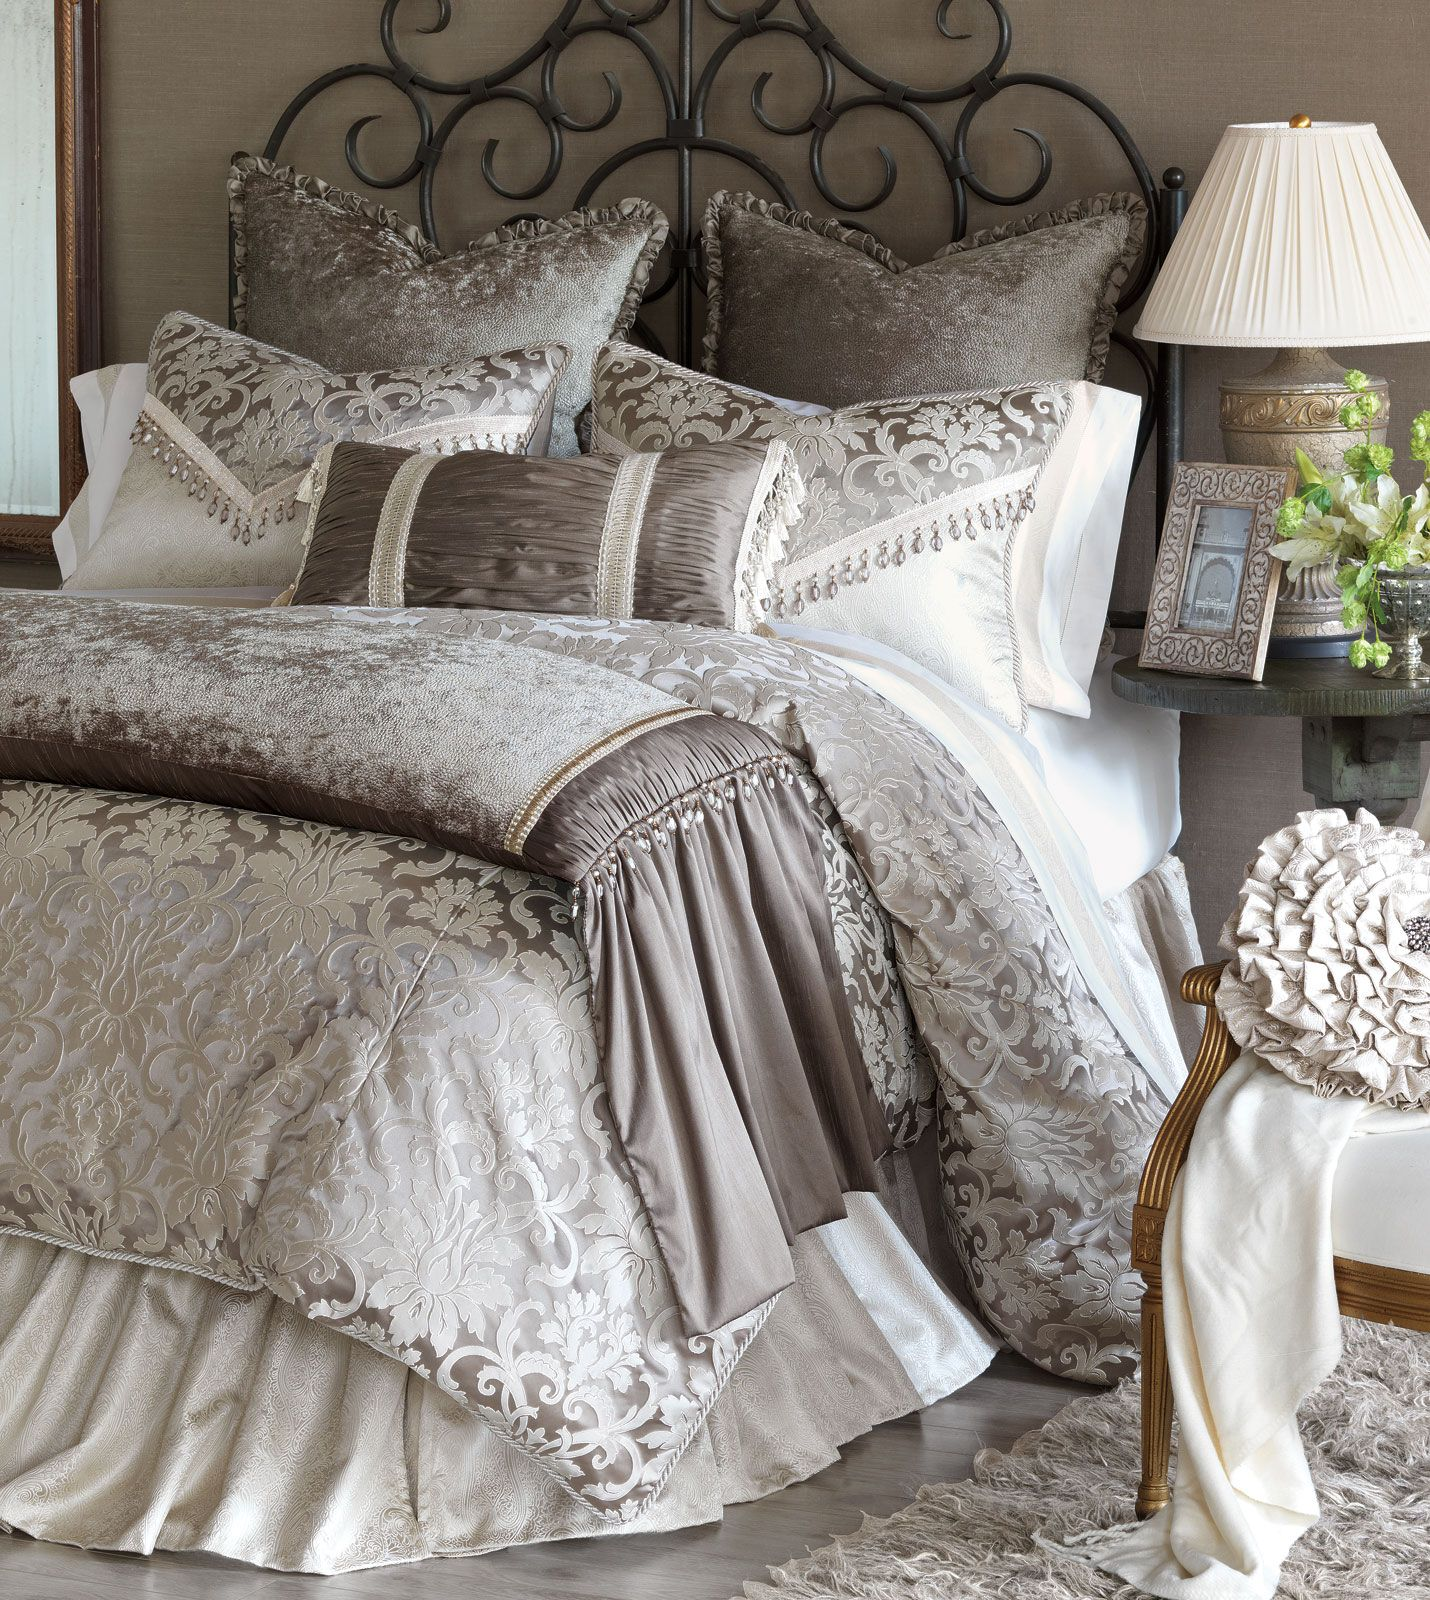 leblanc bed set brings grandeur to its light neutral tones its elegant floral damask